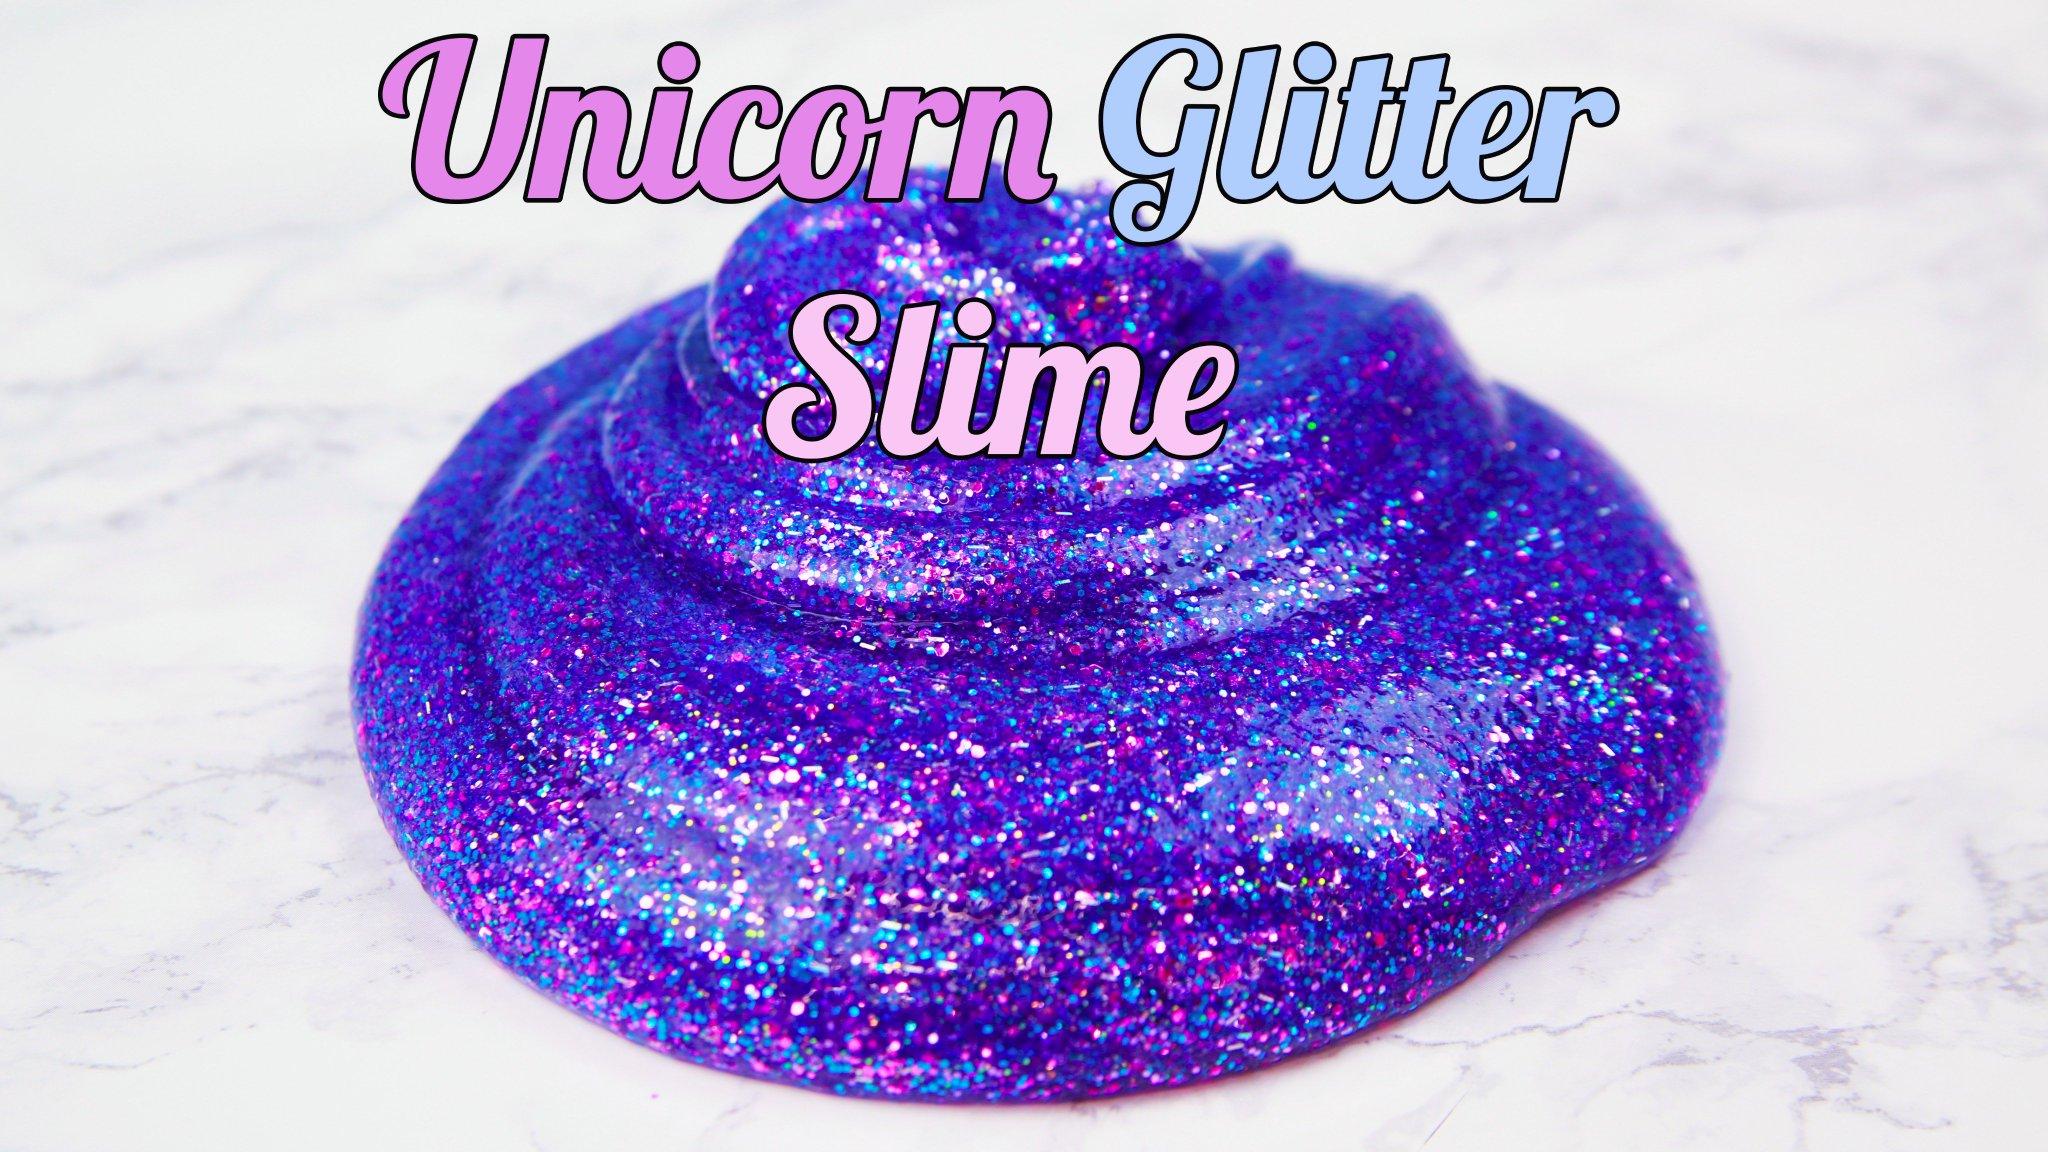 Hellogiggles On Twitter Video This Unicorn Glitter Slime Will